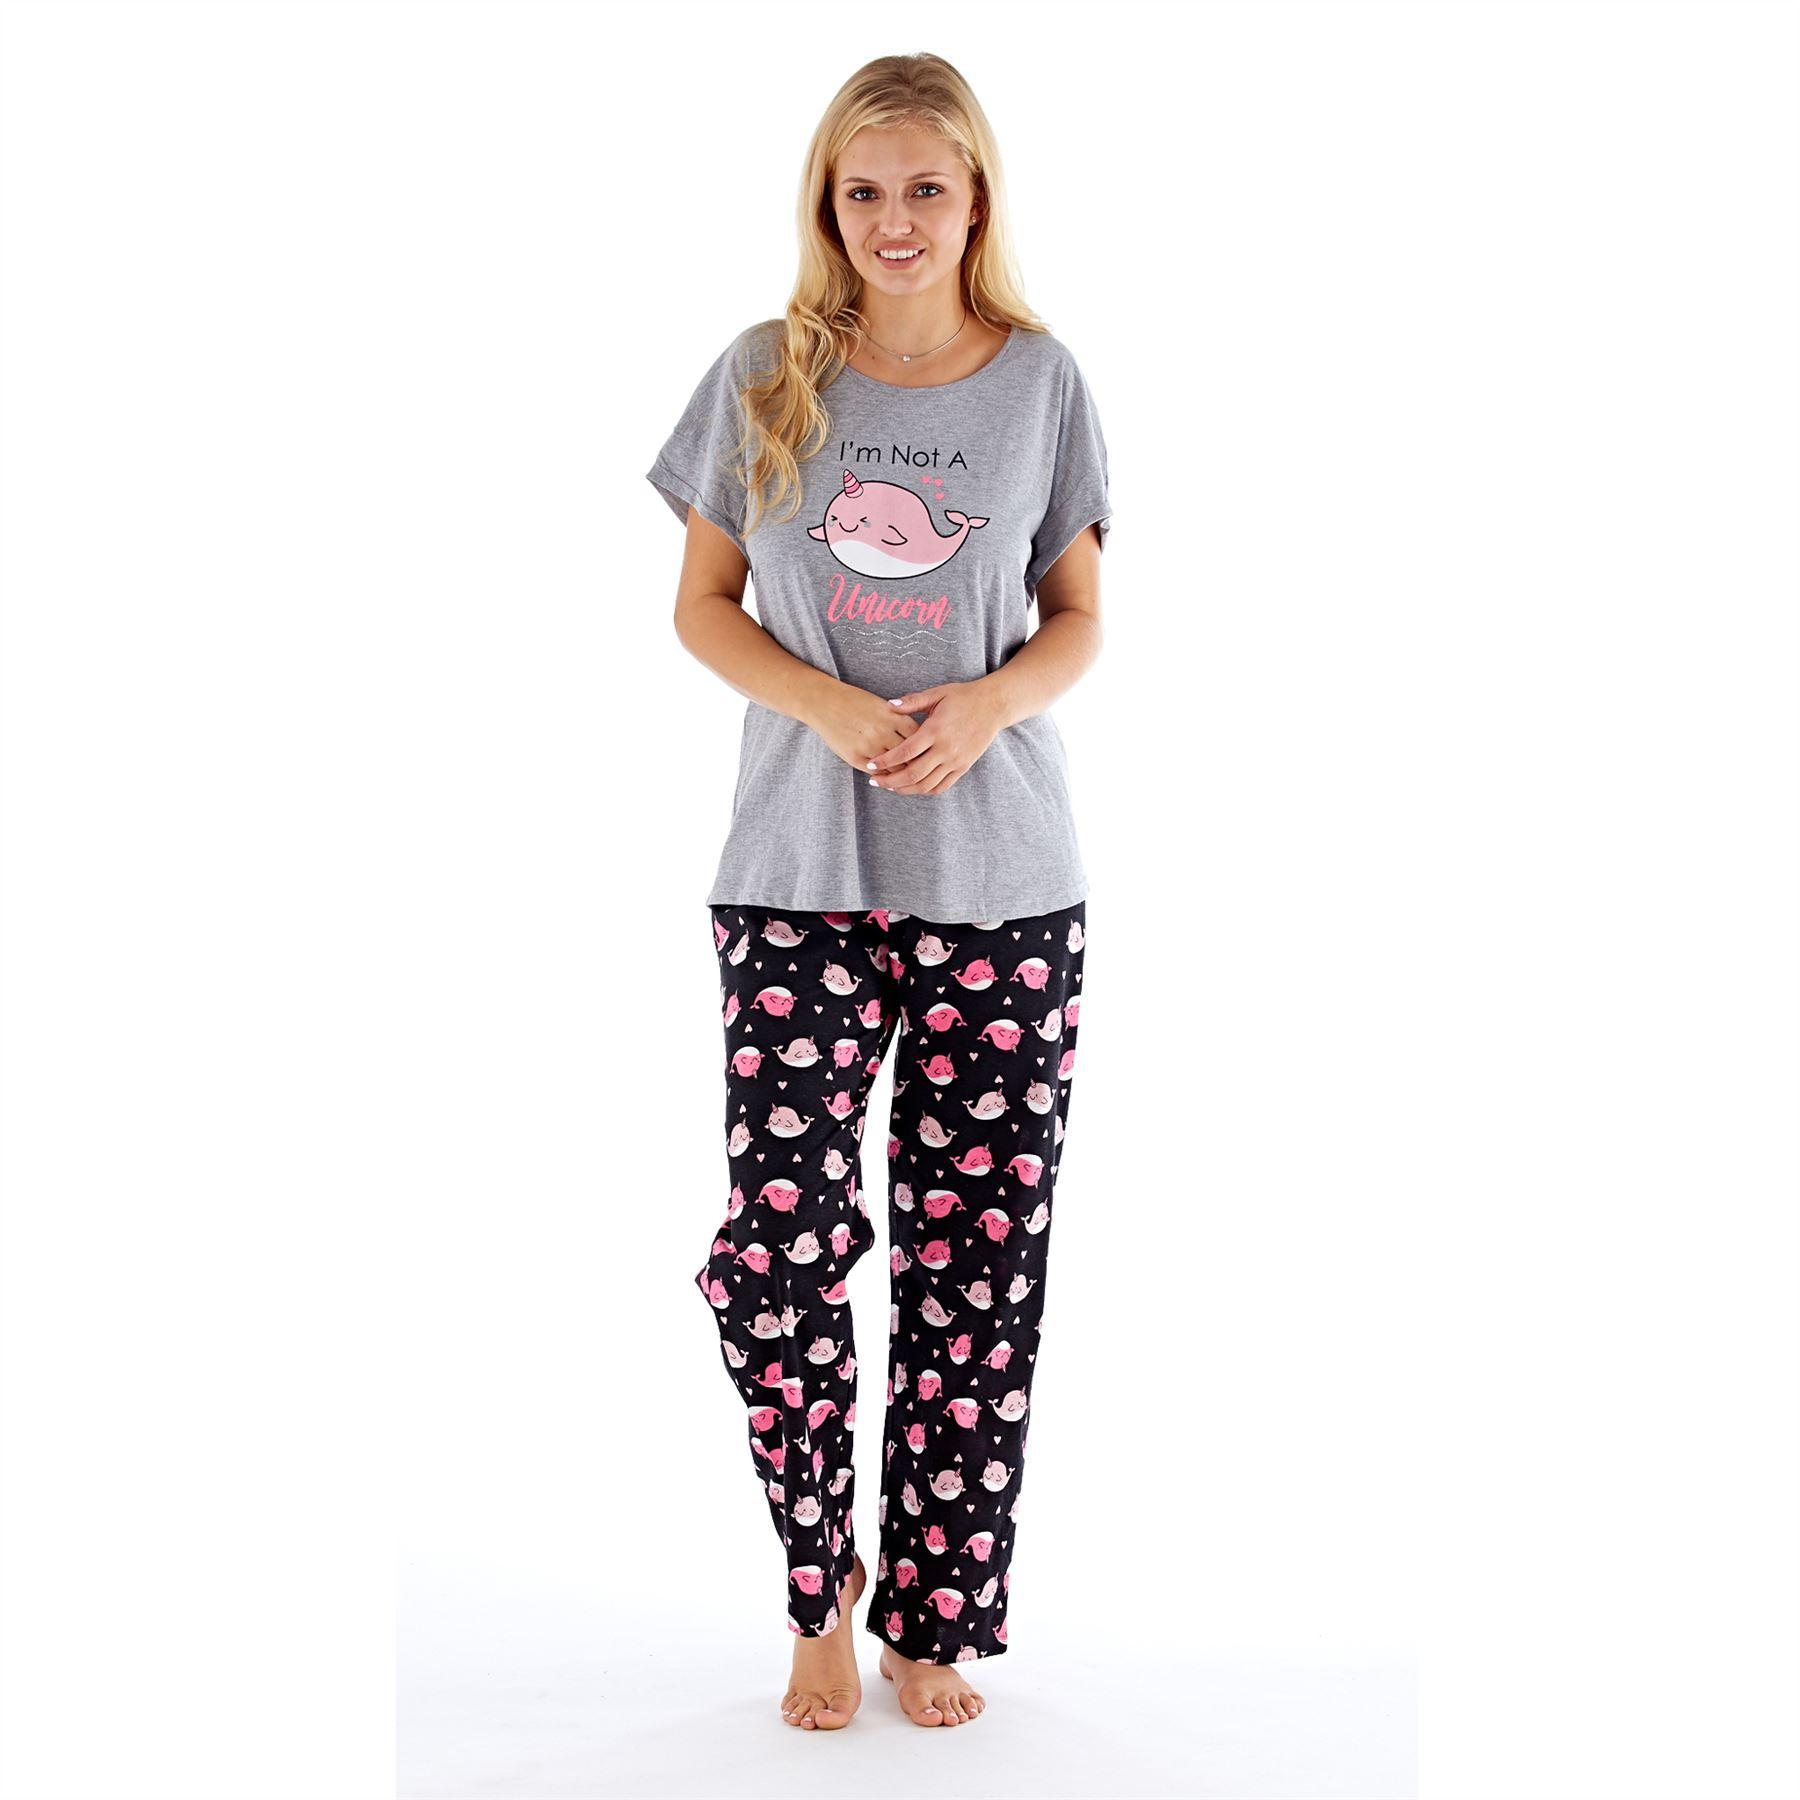 Womens-Ladies-Cotton-Pyjamas-Pyjama-PJs-Summer-Nightwear-Set-Size-8-18-NEW thumbnail 23